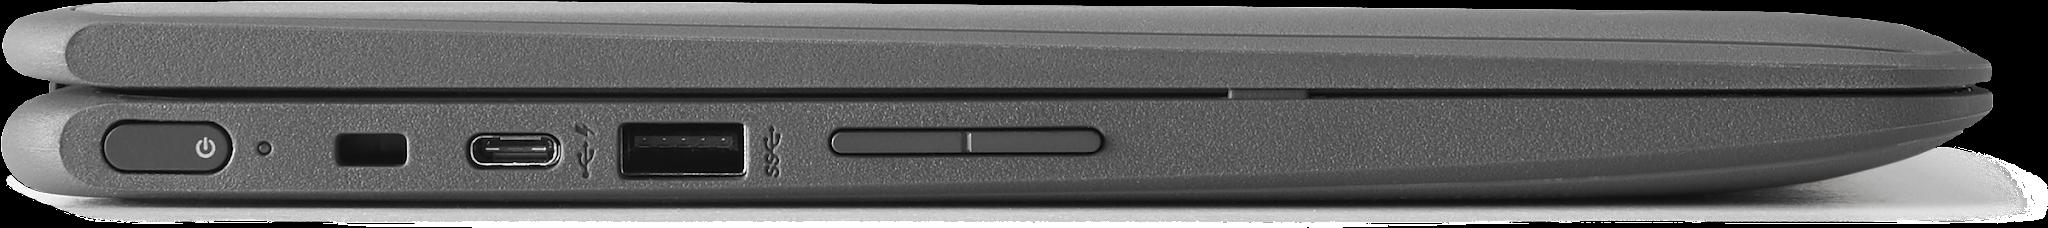 HP Chromebook x360 11 G1 - photo 10